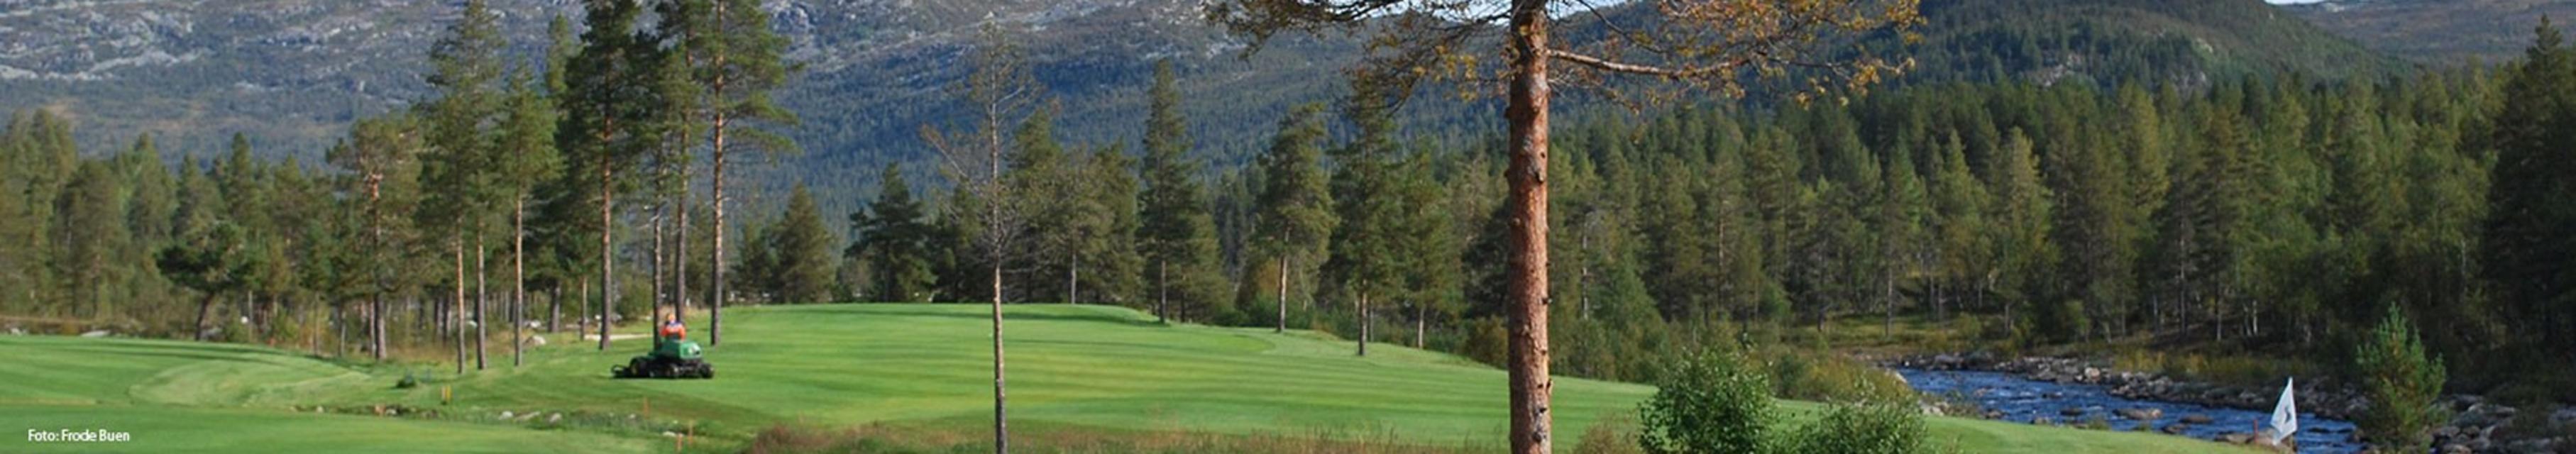 Ørnefjell golfbane hull 8